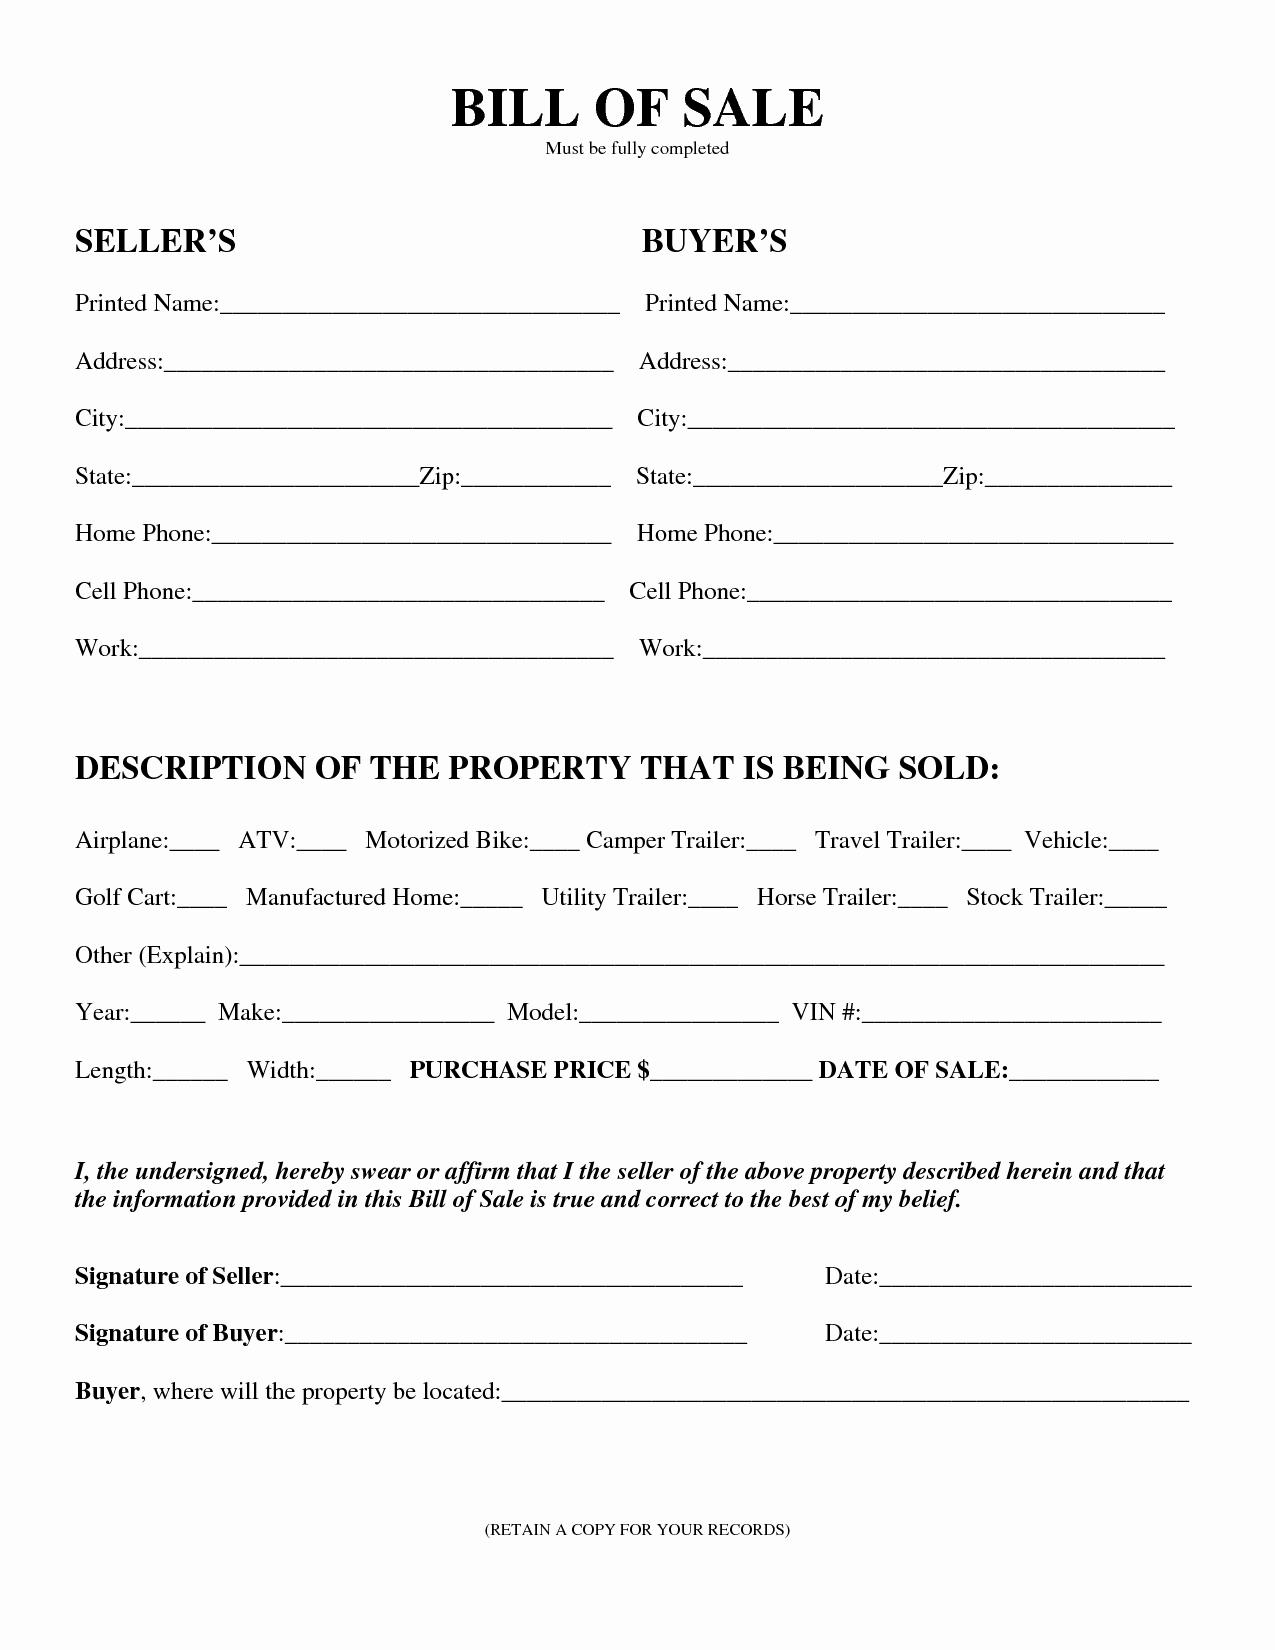 Dealer Bill Of Sale Template Best Of Download Bill Sale form Pdf